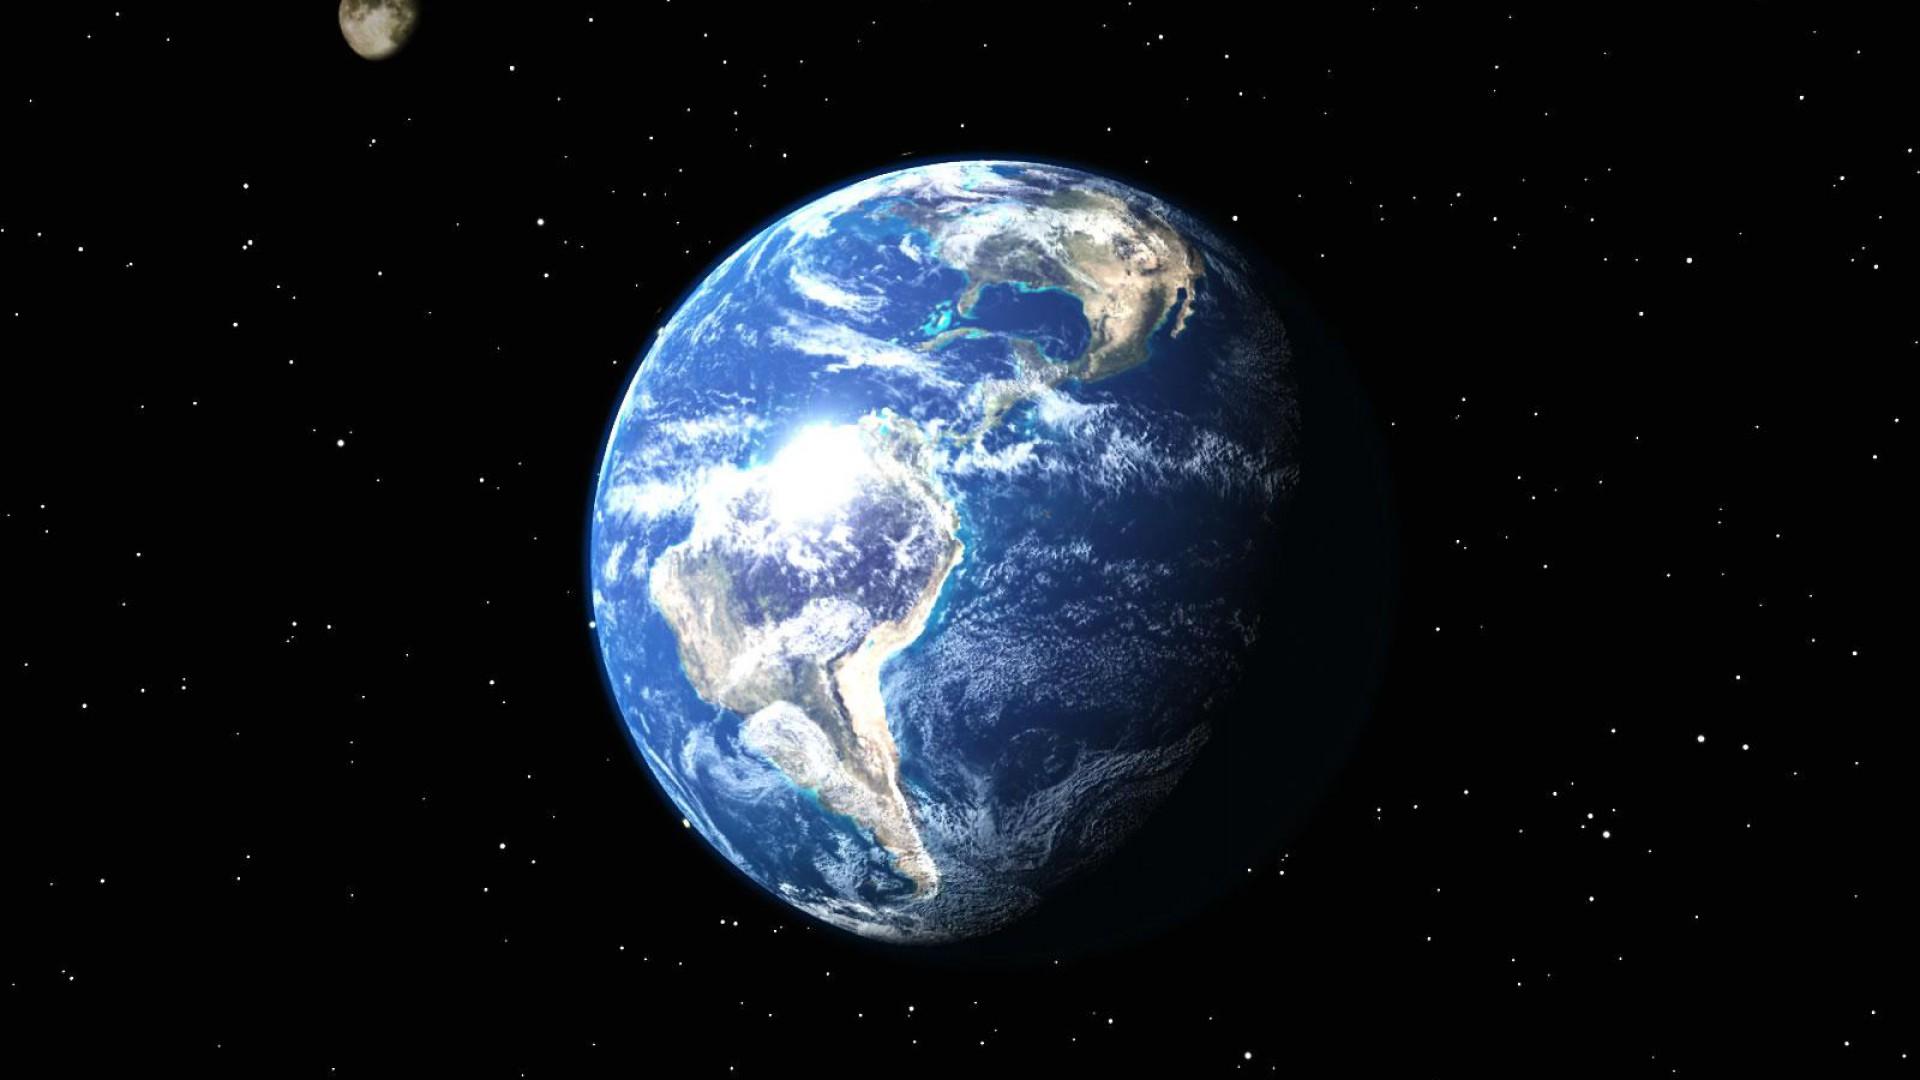 [48+] Earth Wallpaper HD 1080p on WallpaperSafari